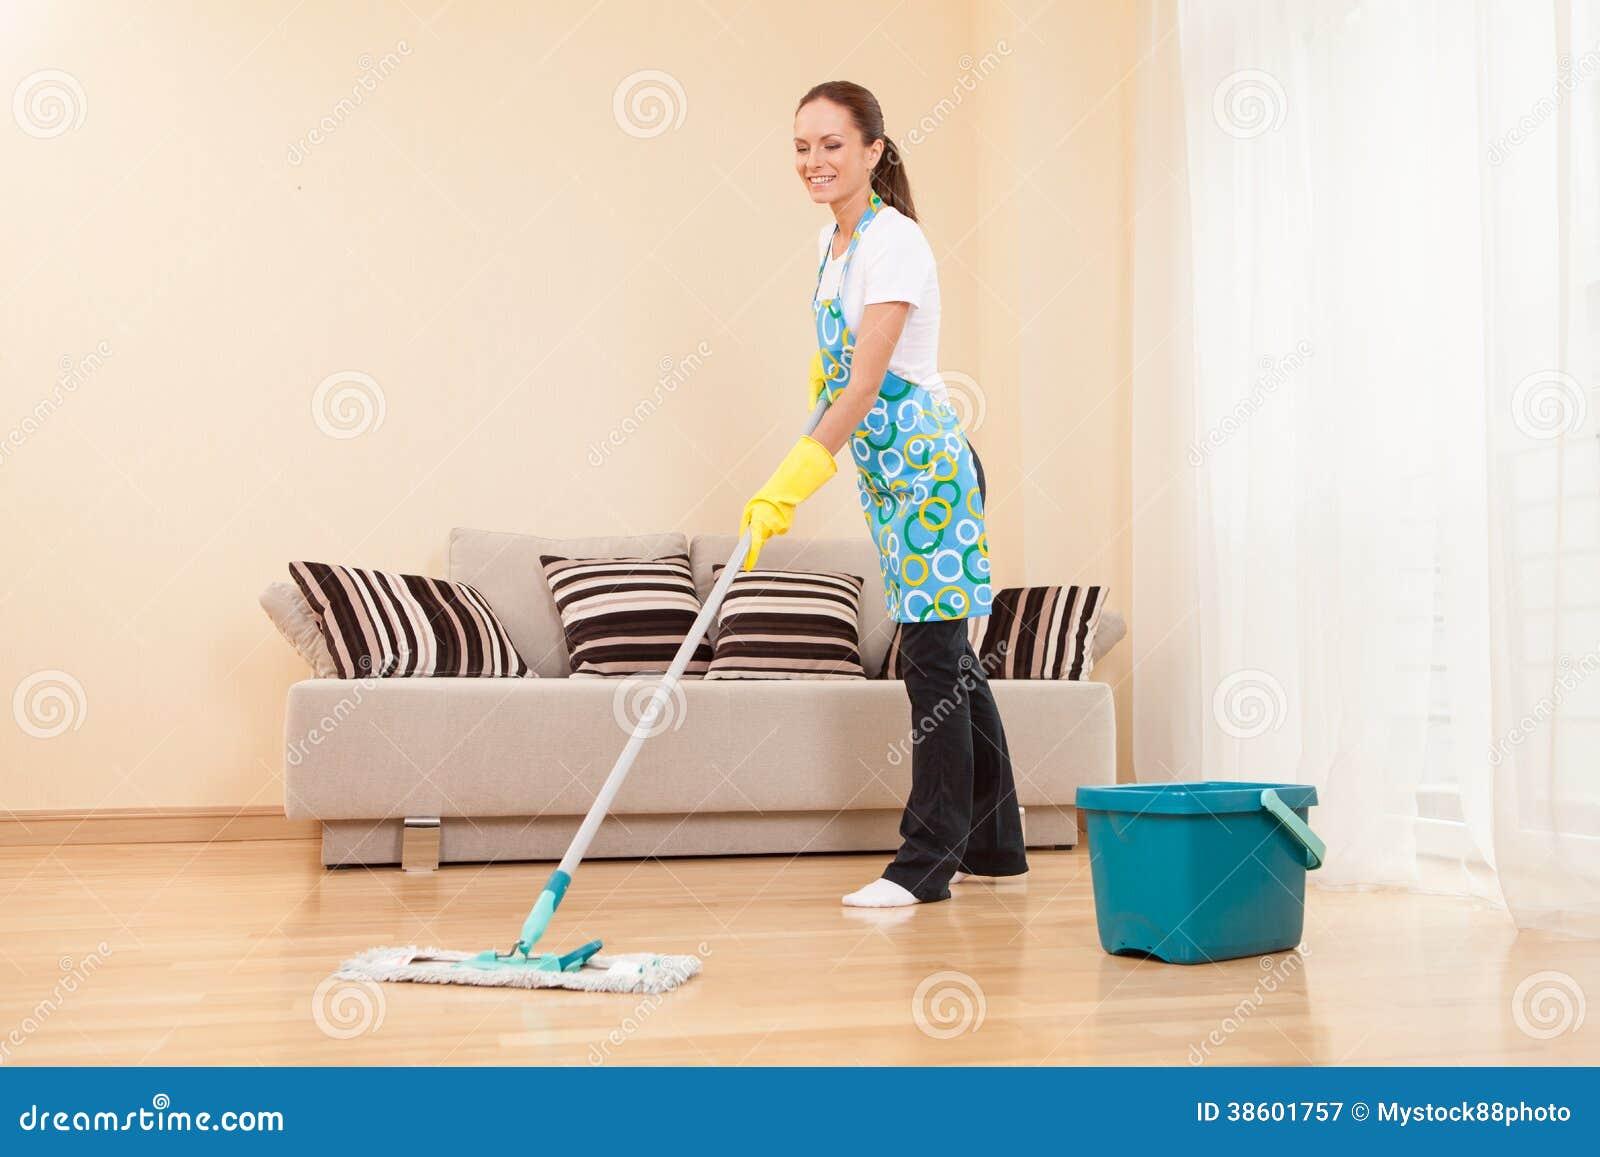 Housework videos masturbation foto 52